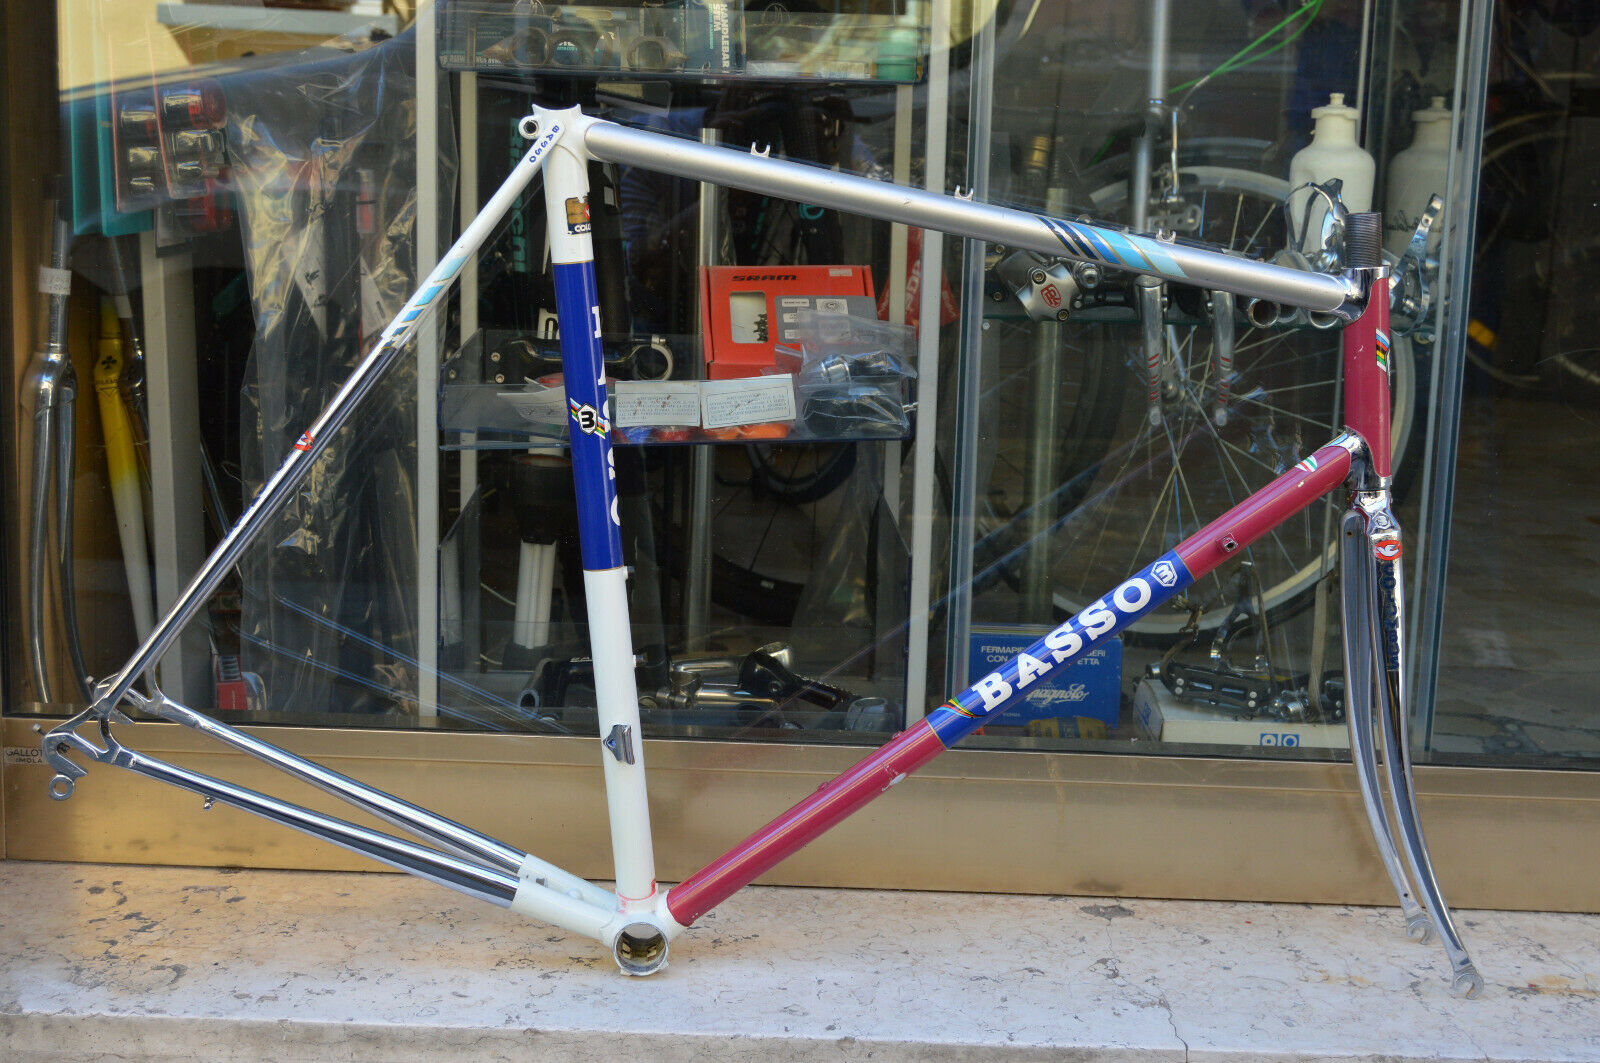 Telaio Basso Steel Frame 57x58cm Palmiro Masciarelli vintage in ottime condizion